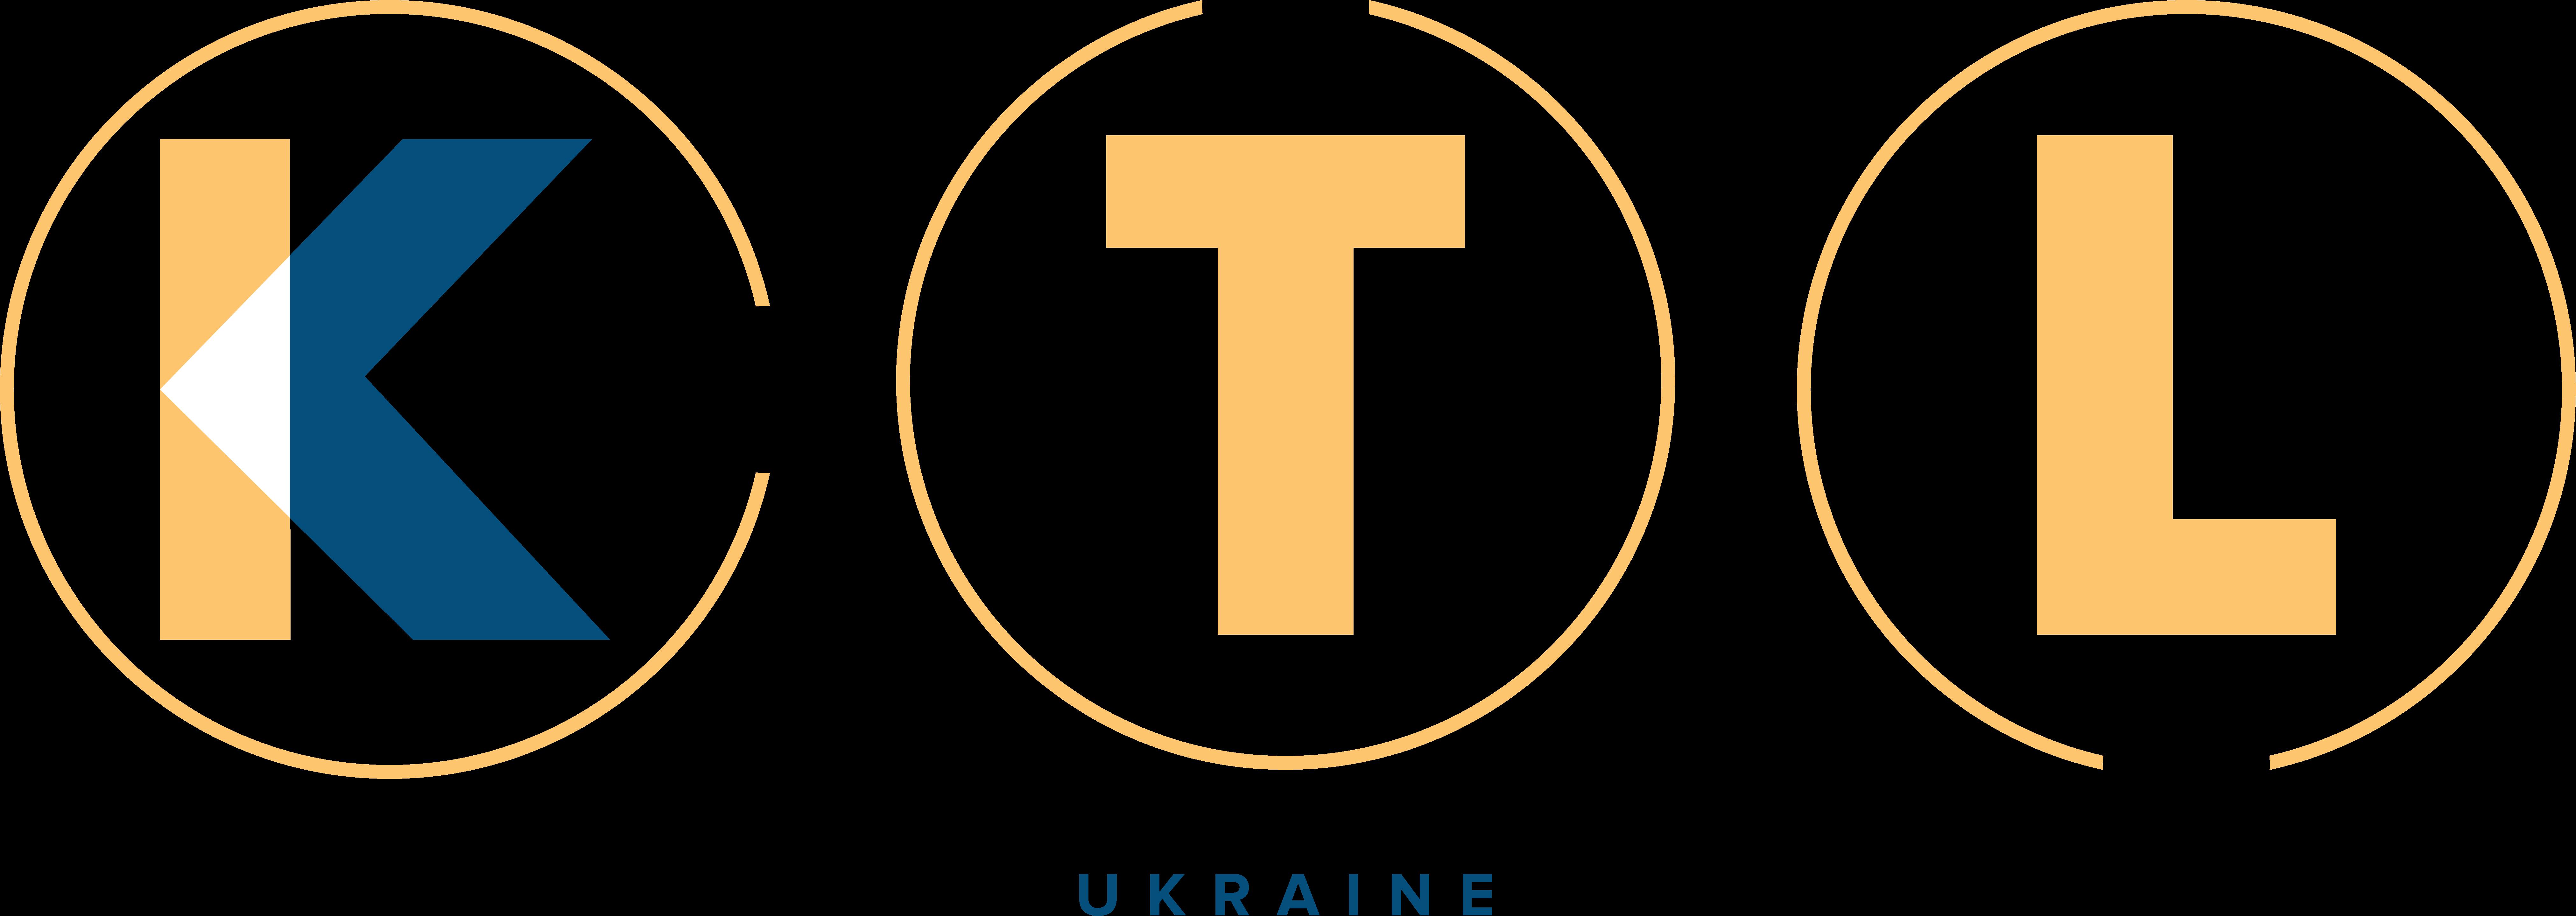 ktl-ukraine-logo-newcol png1 (1)